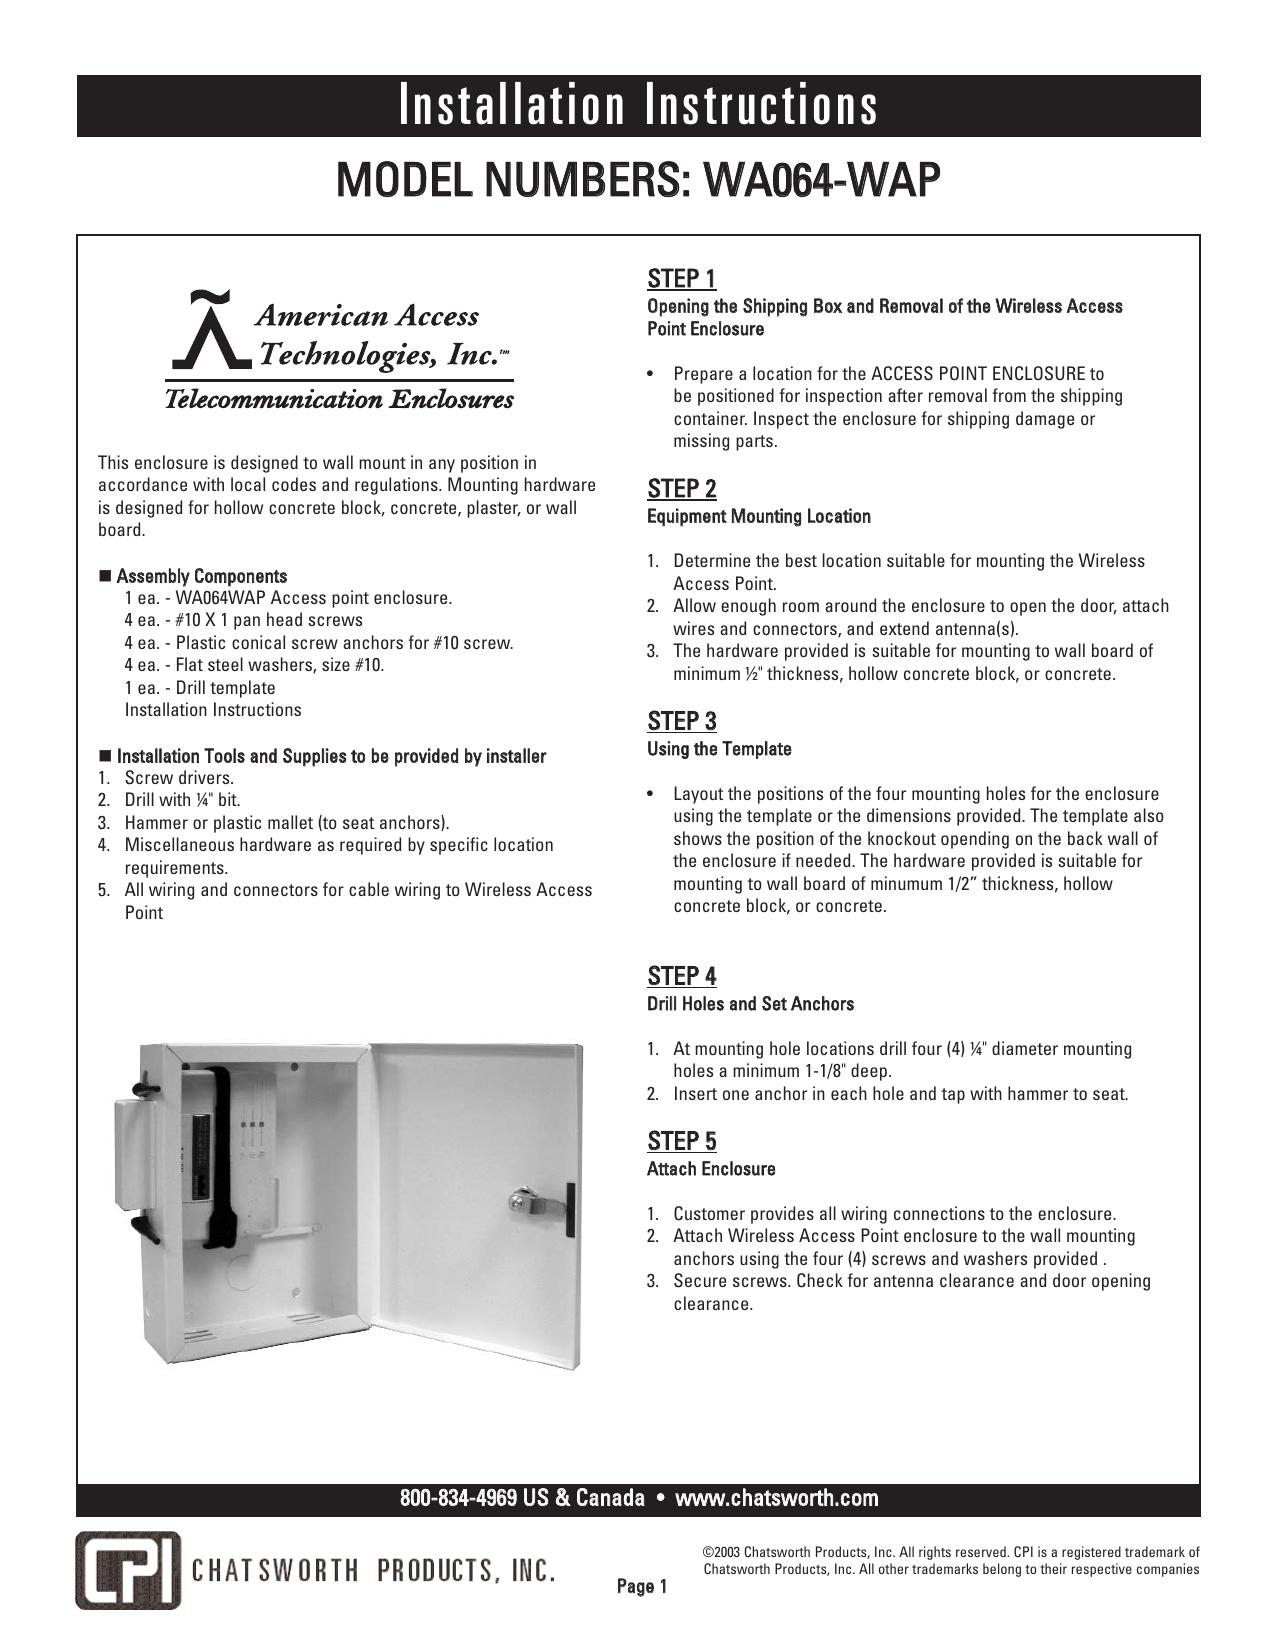 Installation Instructions | manualzz.com on